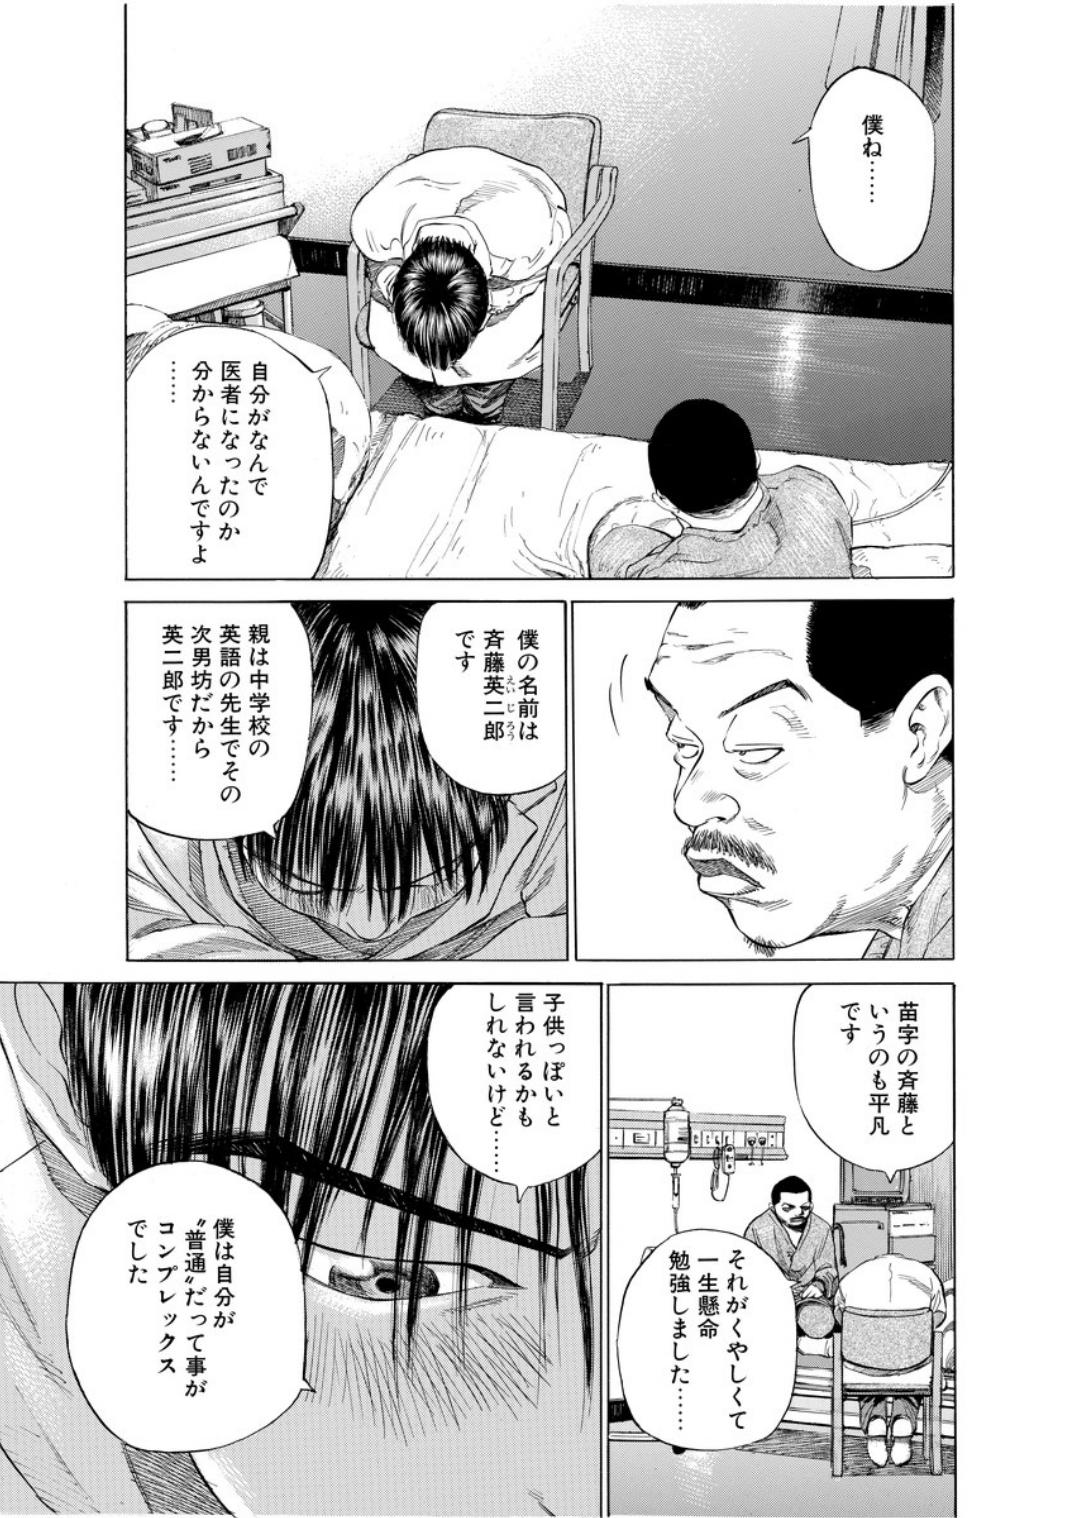 001bj_page-0181.jpg